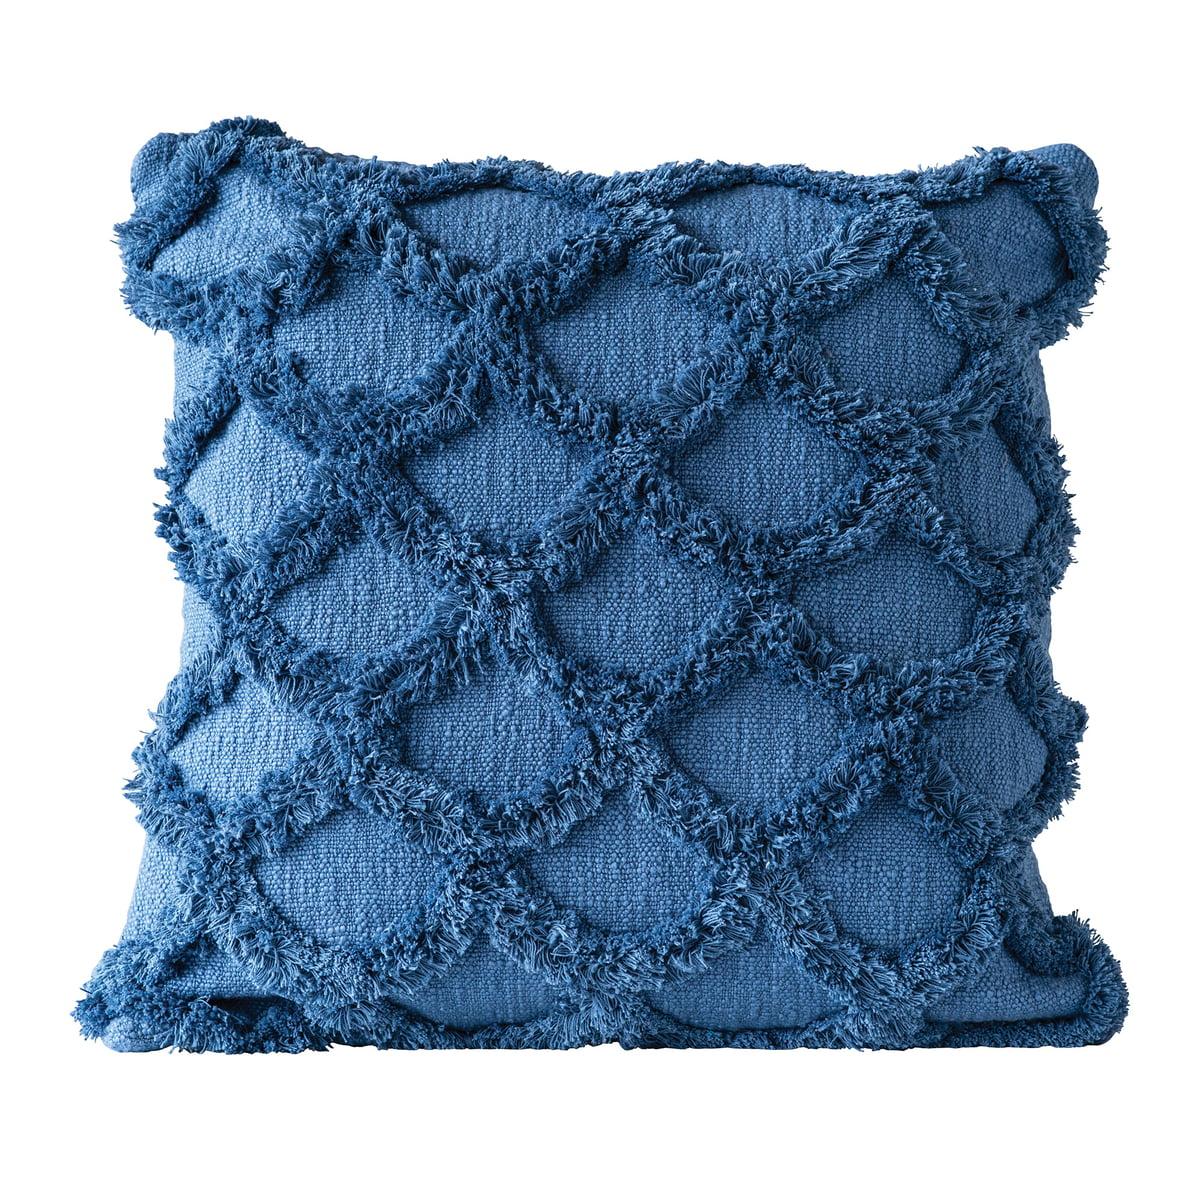 Bloomingville gathering kissen l 45 x w 45 cm blau einzel